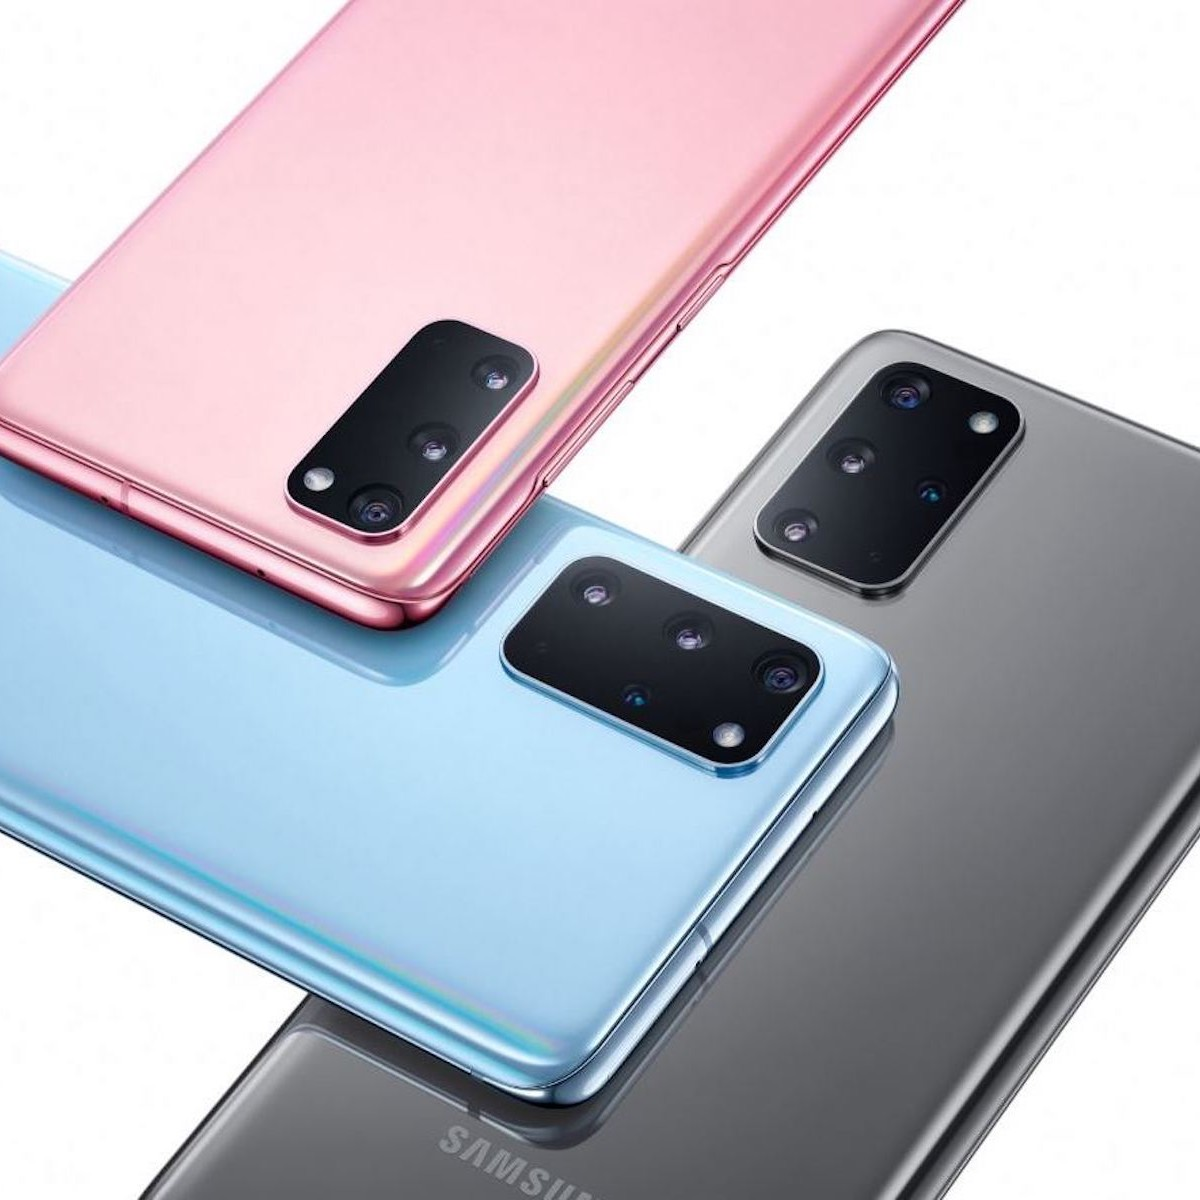 Samsung Galaxy S20 and S20+ Series 5G Edition Smartphones boast AI camera technology